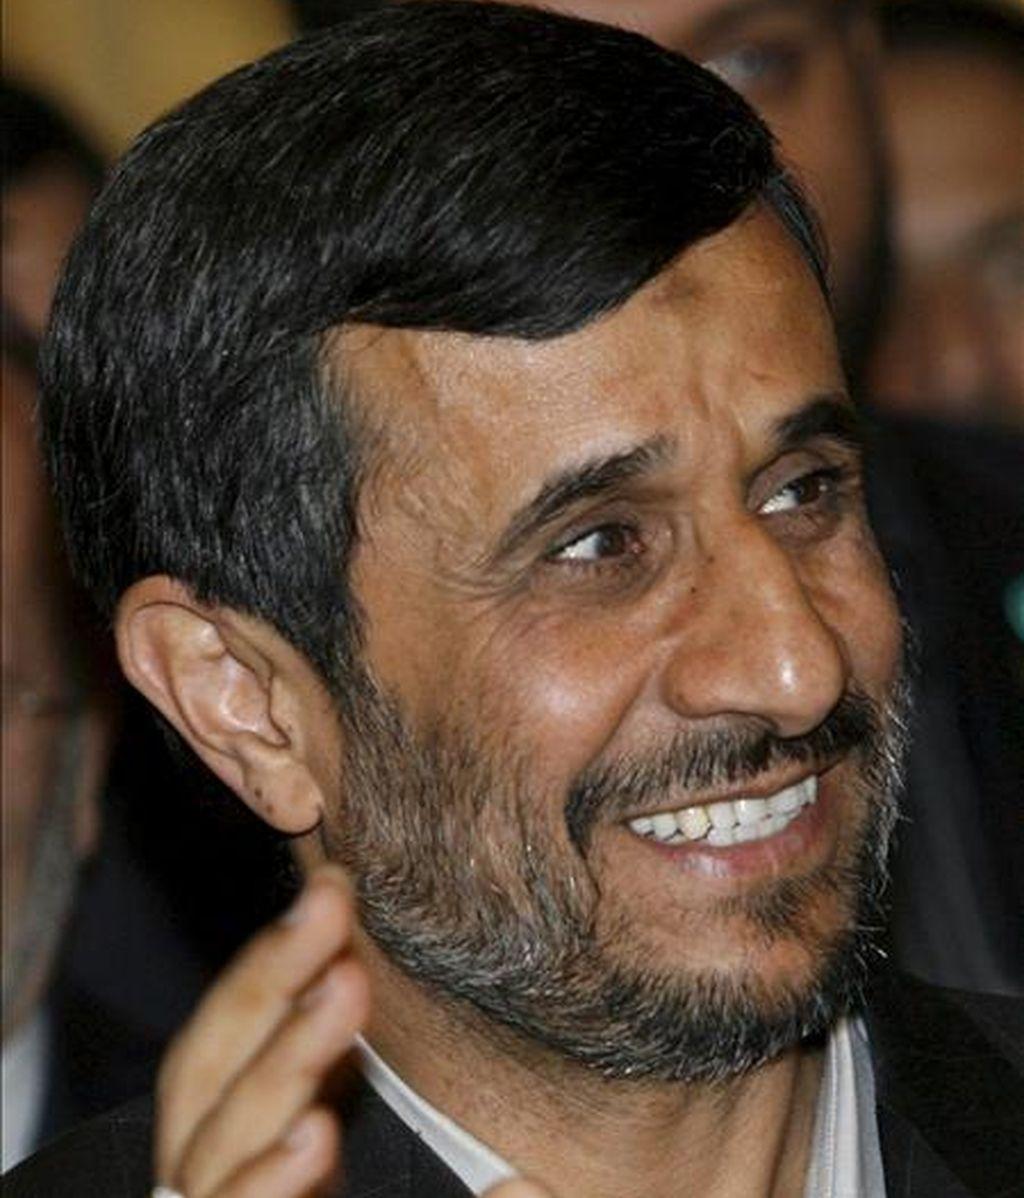 El presidente iraní, Mahmud Ahmadineyad, hoy en Ginebra. EFE